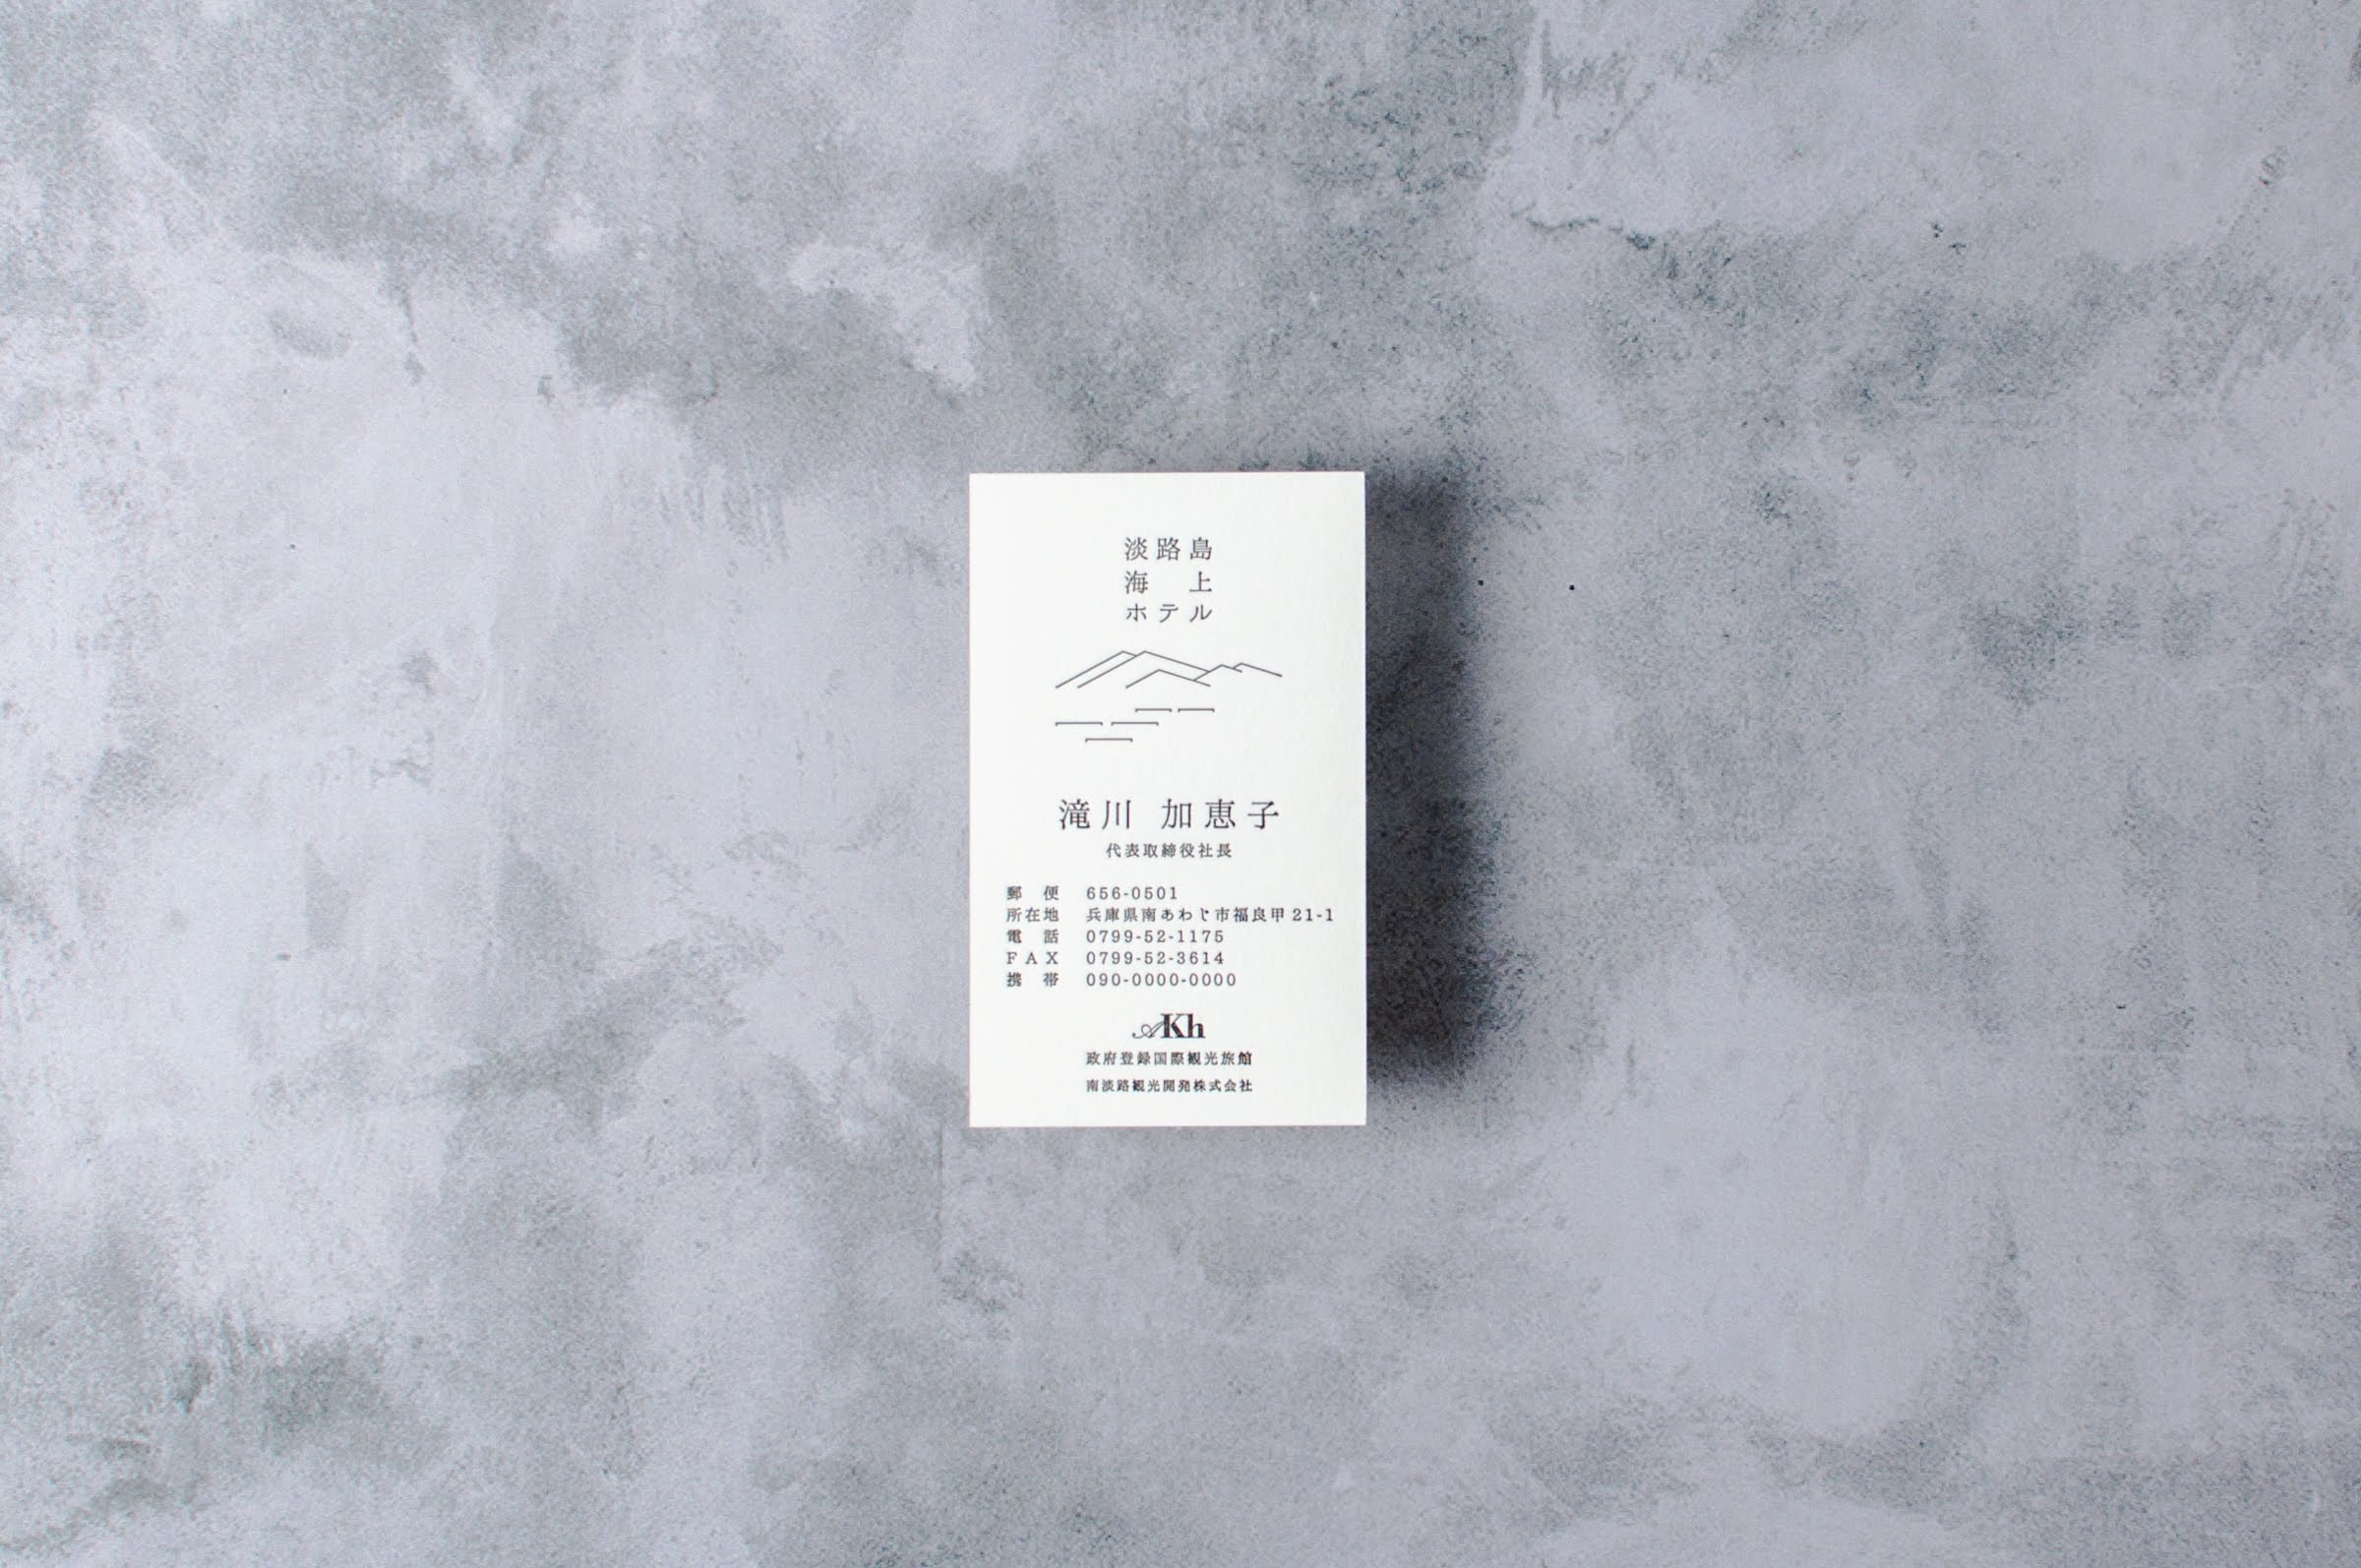 Awajishima Kaijo Hotel|NAME CARD